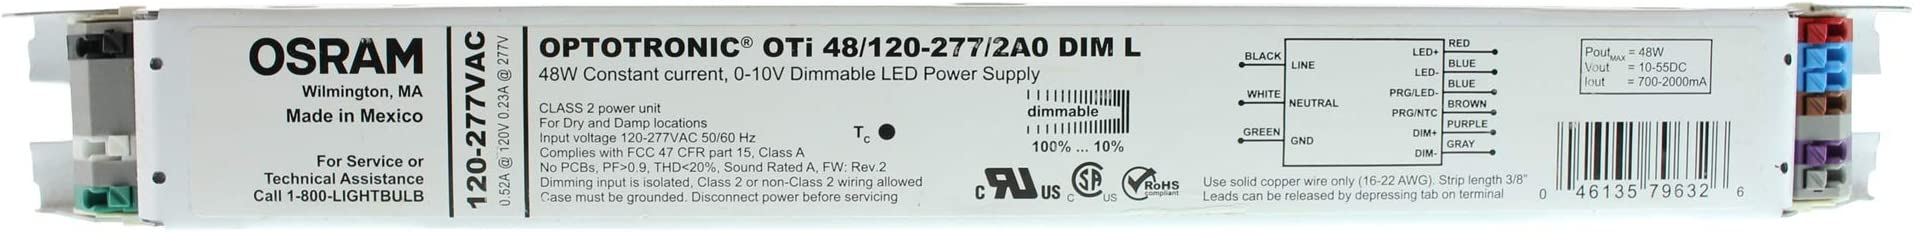 Osram OTi50//120-277//1A4 DIM-1 L 50W 0-10V Dimmable LED PSU **Free Shipping**